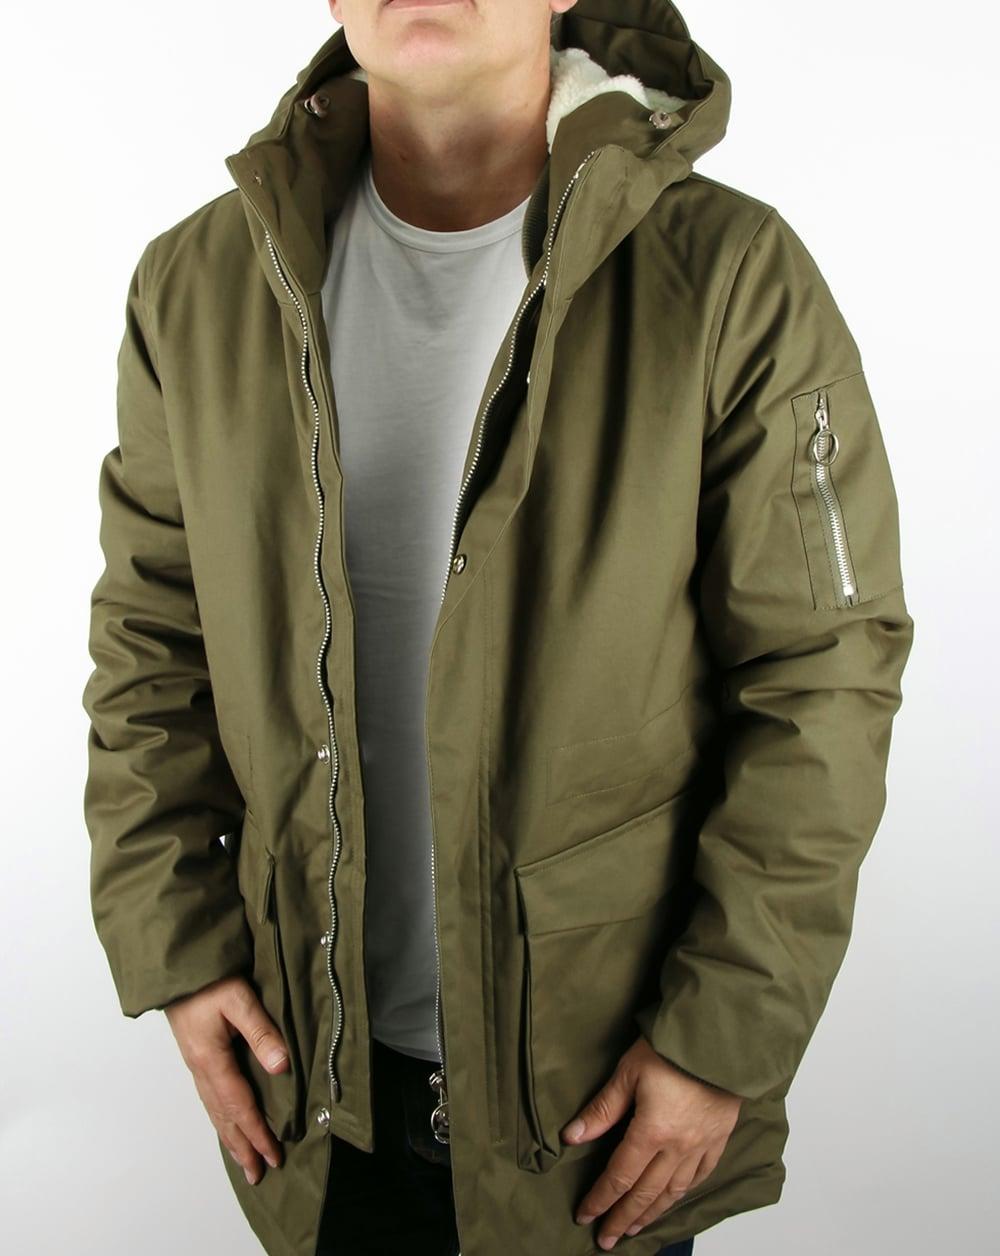 b601077b55aa4 Bellfield Ramaty Parka Khaki,padded,hooded,coat,jacket,mens